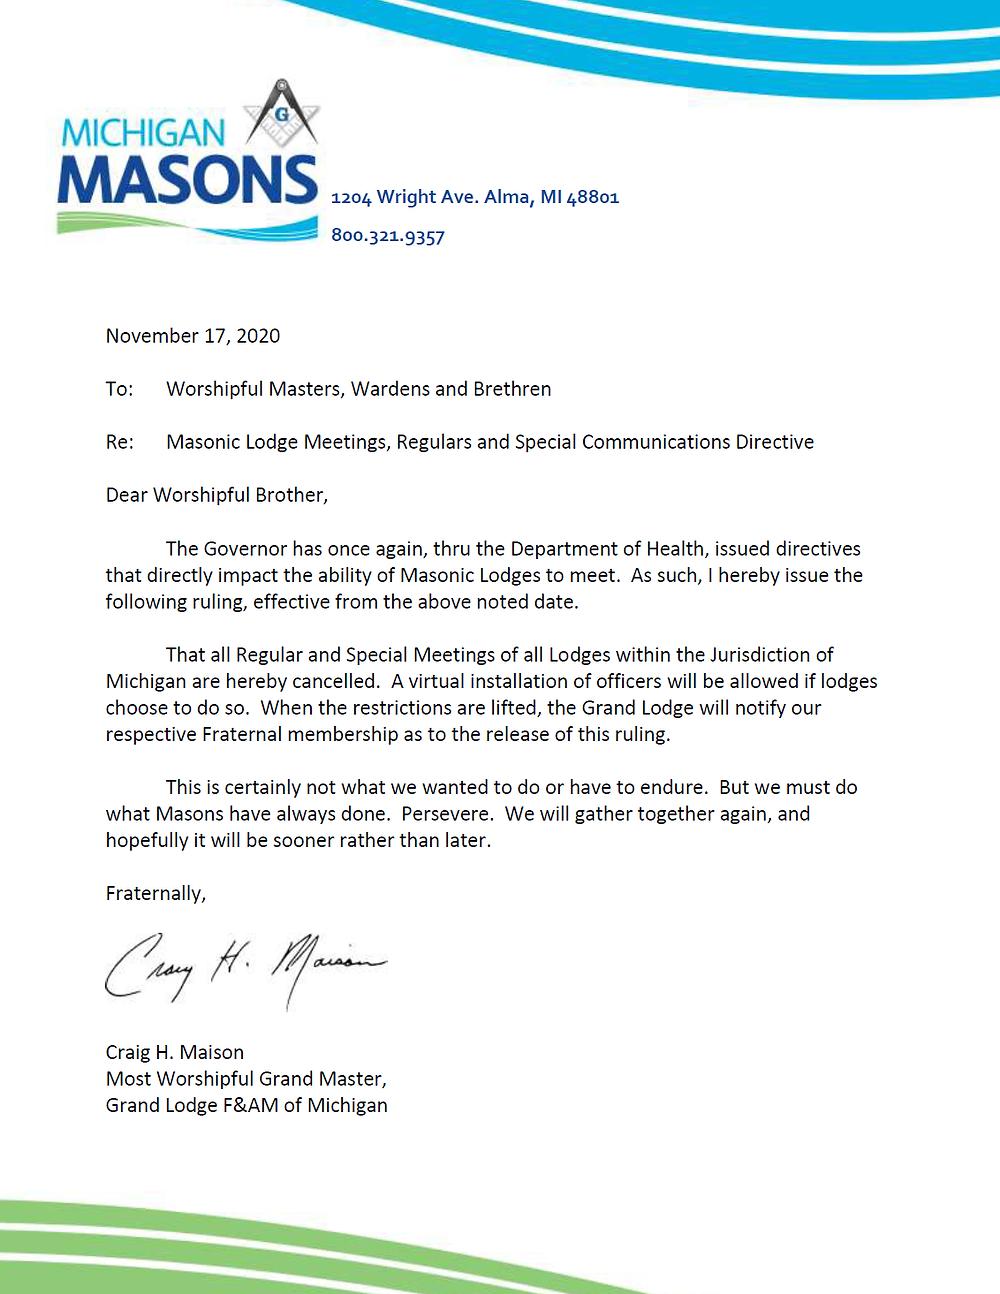 Freemasonry - Craig Maison, Grand Master, Grande Lodge of Michigan